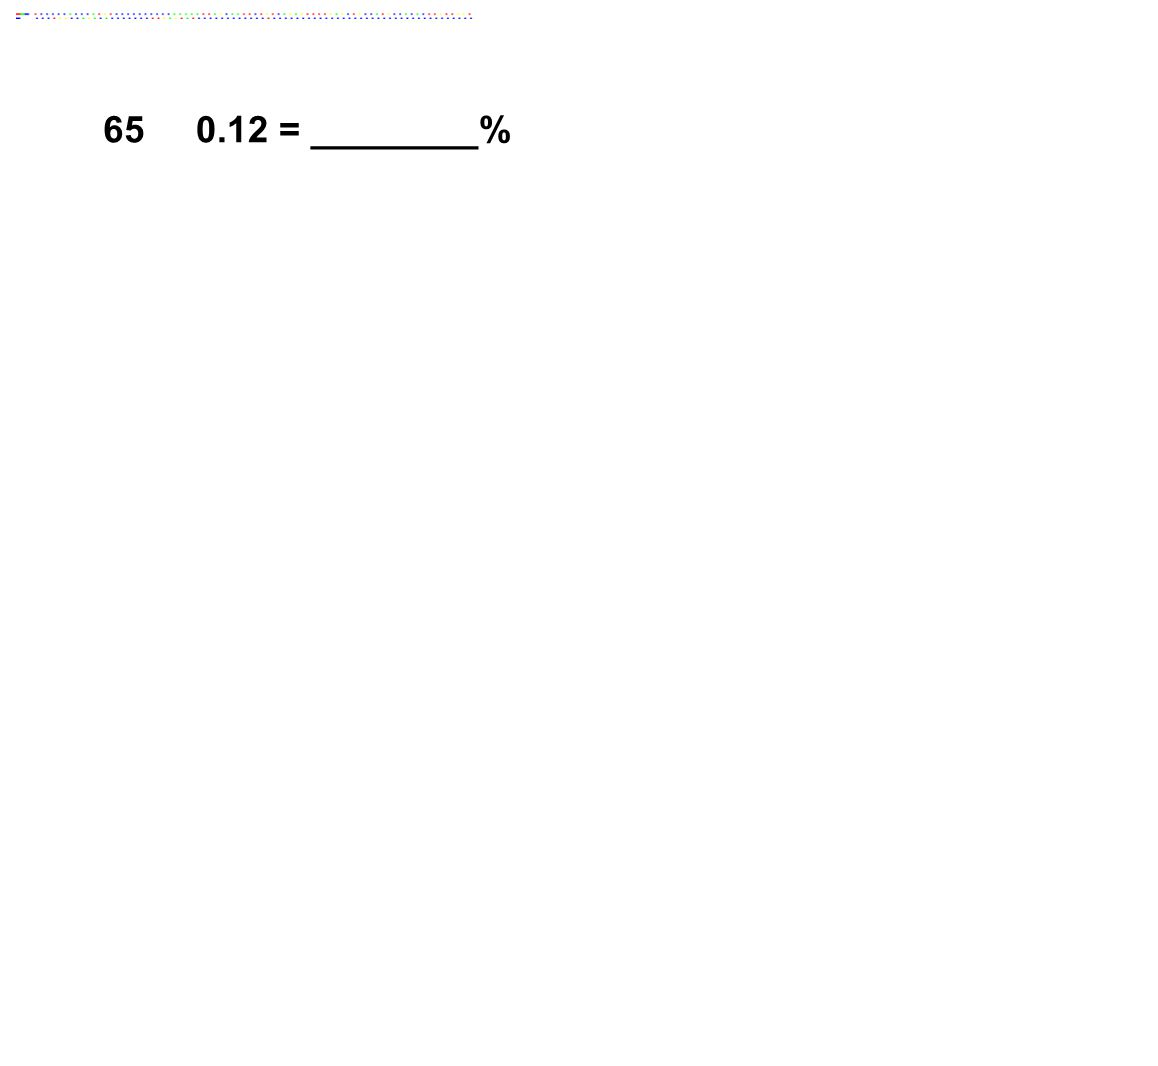 650.12 = ________%